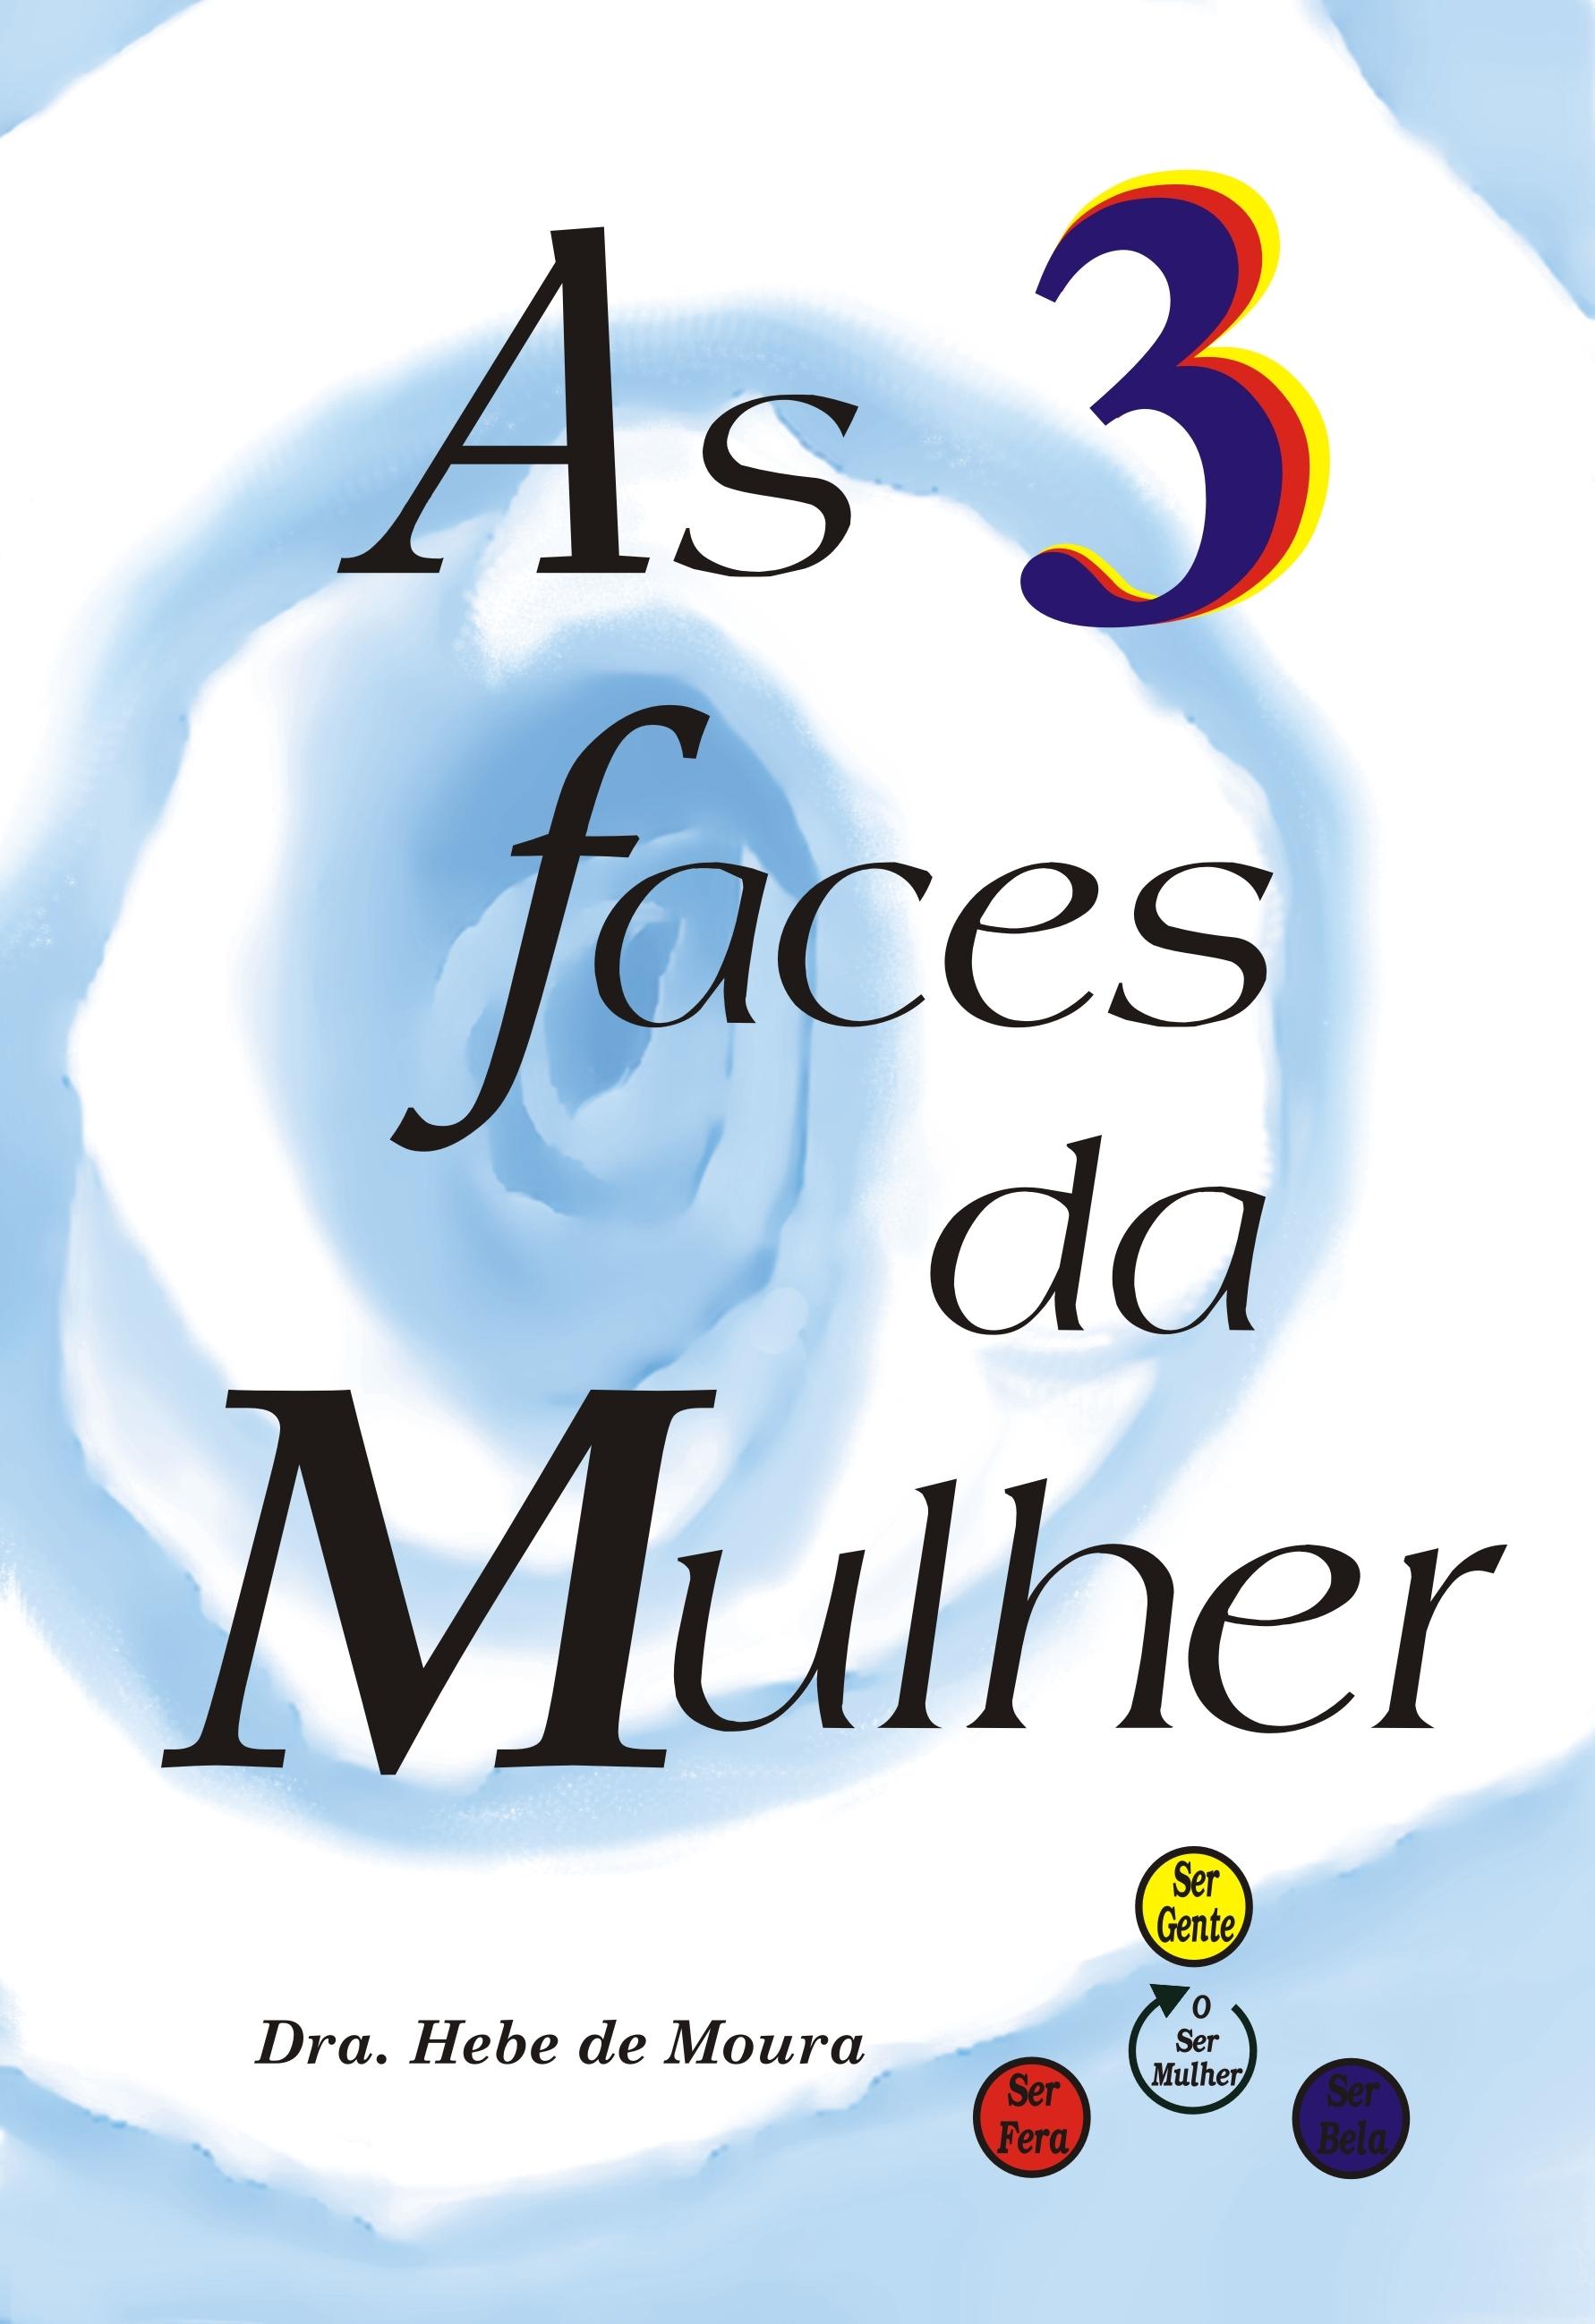 as_3faces_da_mulher